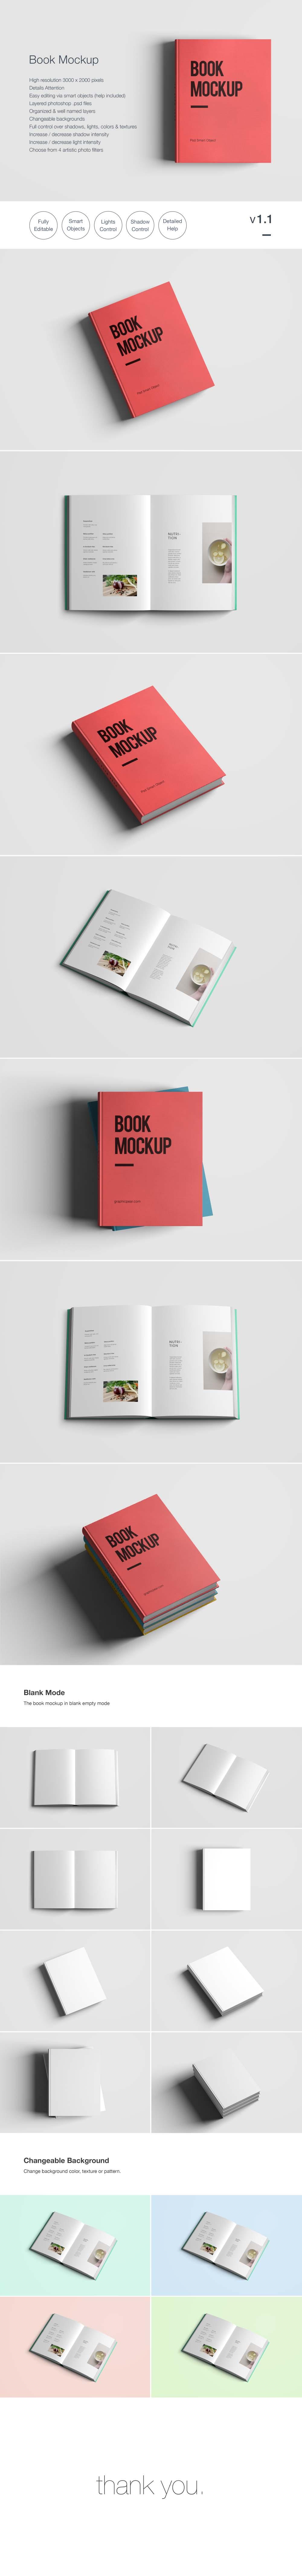 Book Mockup Psd Smart Object Mockup Mockup Free Psd Mockup Psd